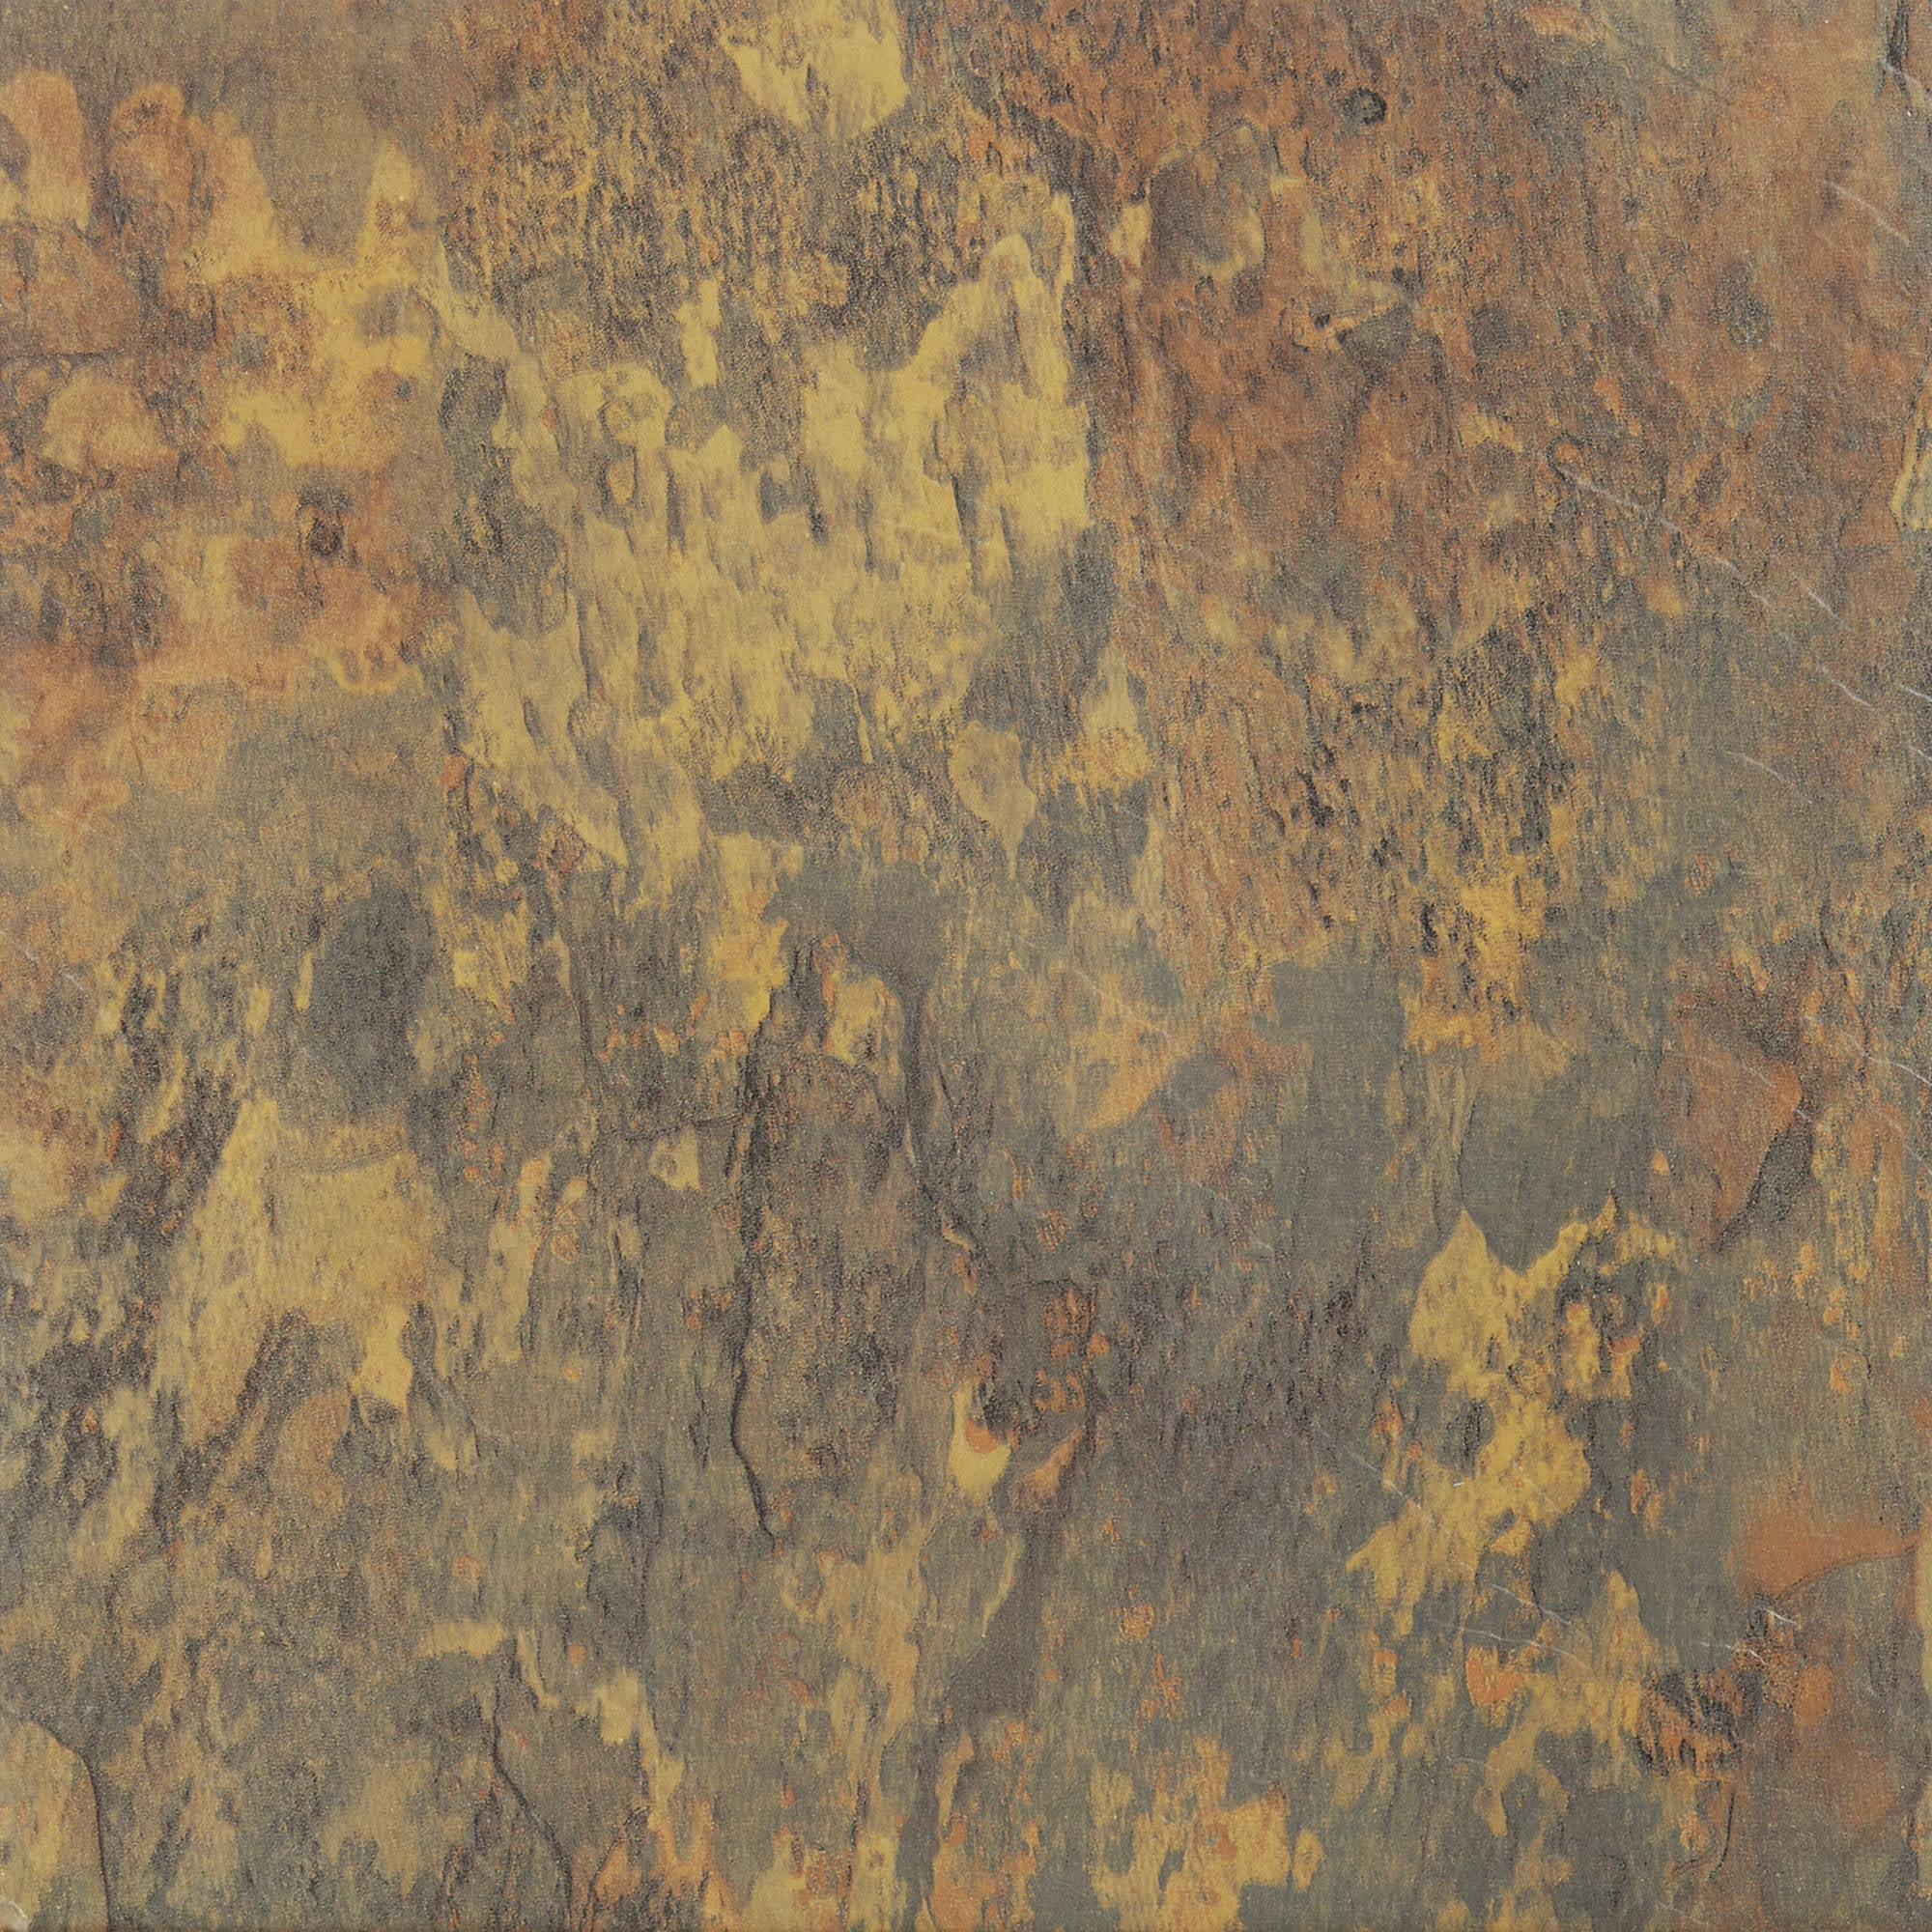 Nexus antique marble 12x12 self adhesive vinyl floor tile 20 nexus antique marble 12x12 self adhesive vinyl floor tile 20 tiles20 sqft walmart dailygadgetfo Image collections